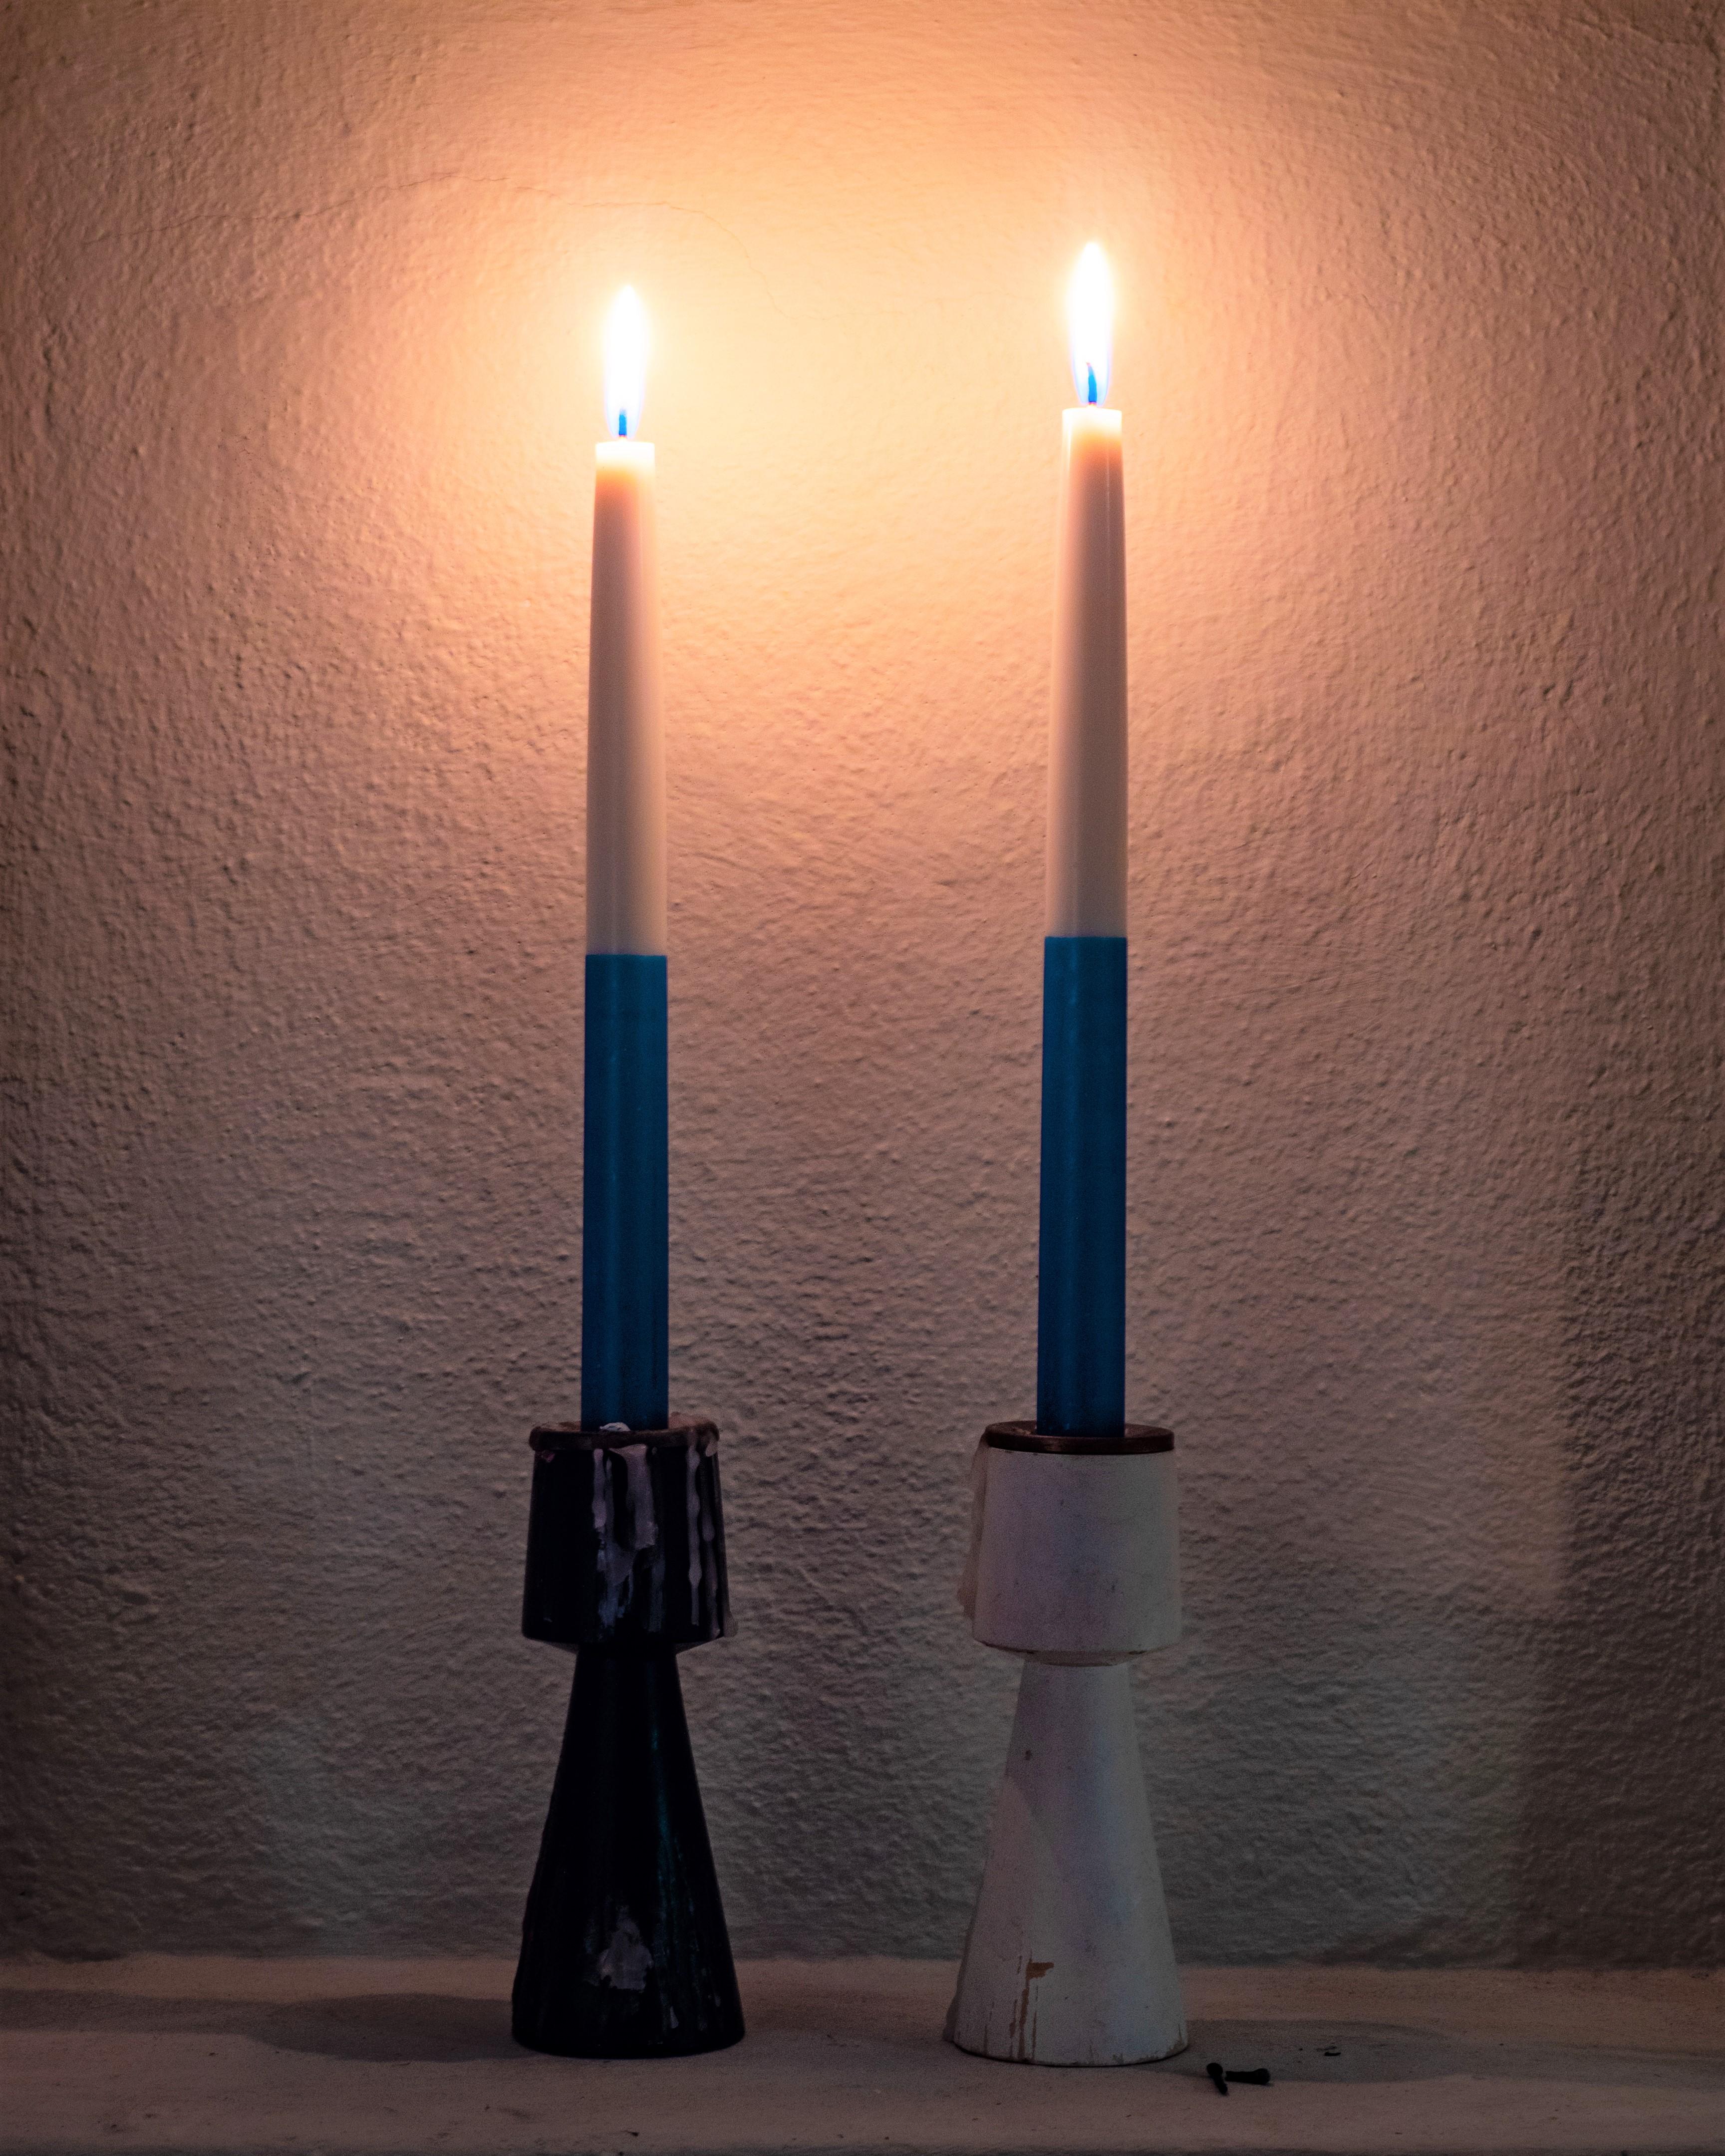 Kaksi kynttilää. Tuukka Lindholm.